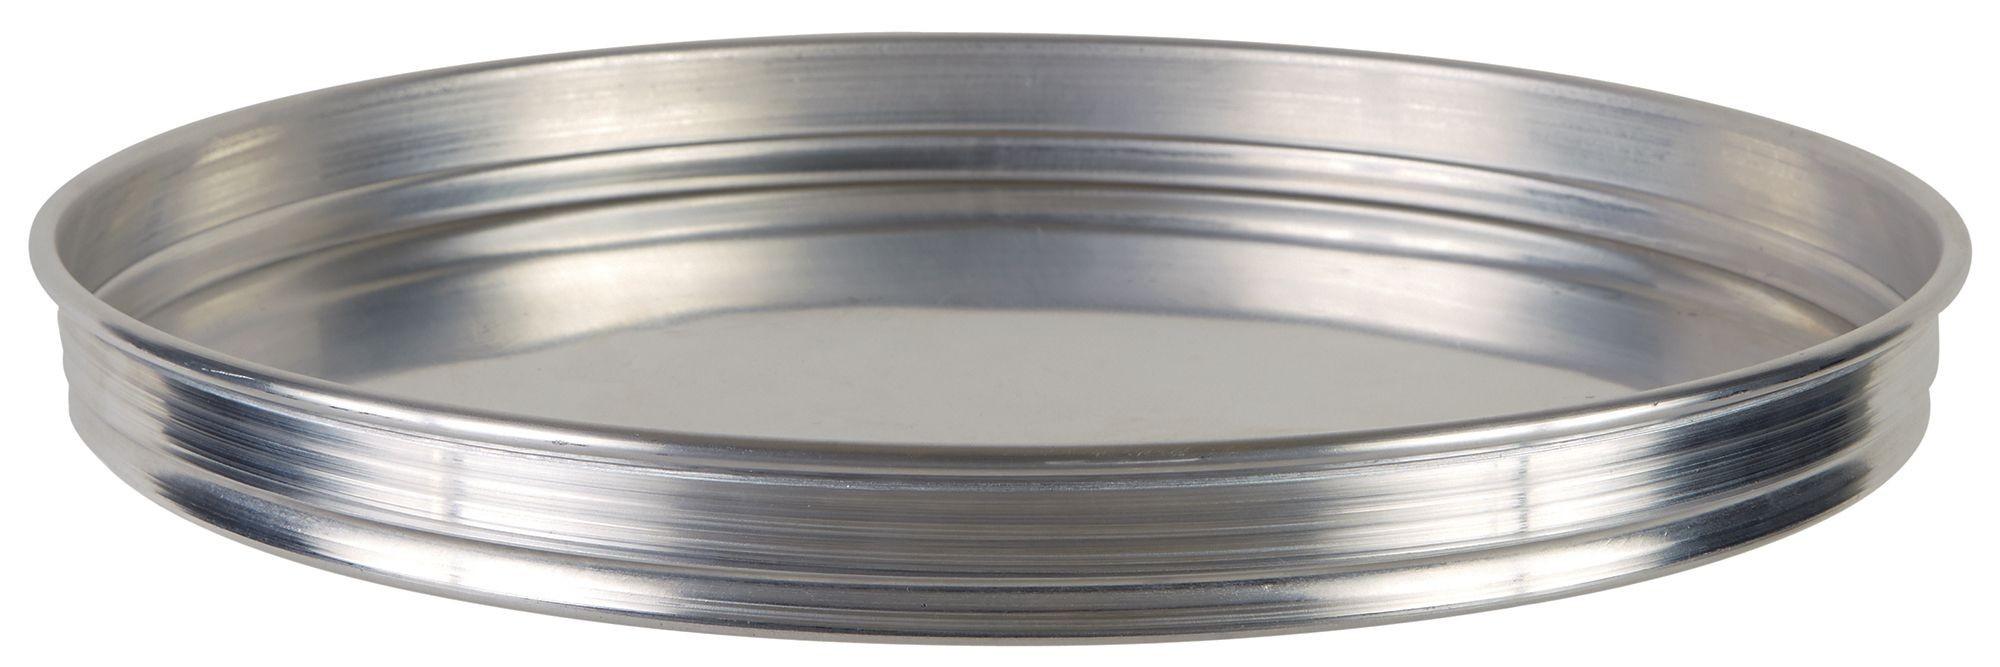 "Winco APZK-1415 14"" x 1-1/2"" Stackable Aluminum Pizza Pan"